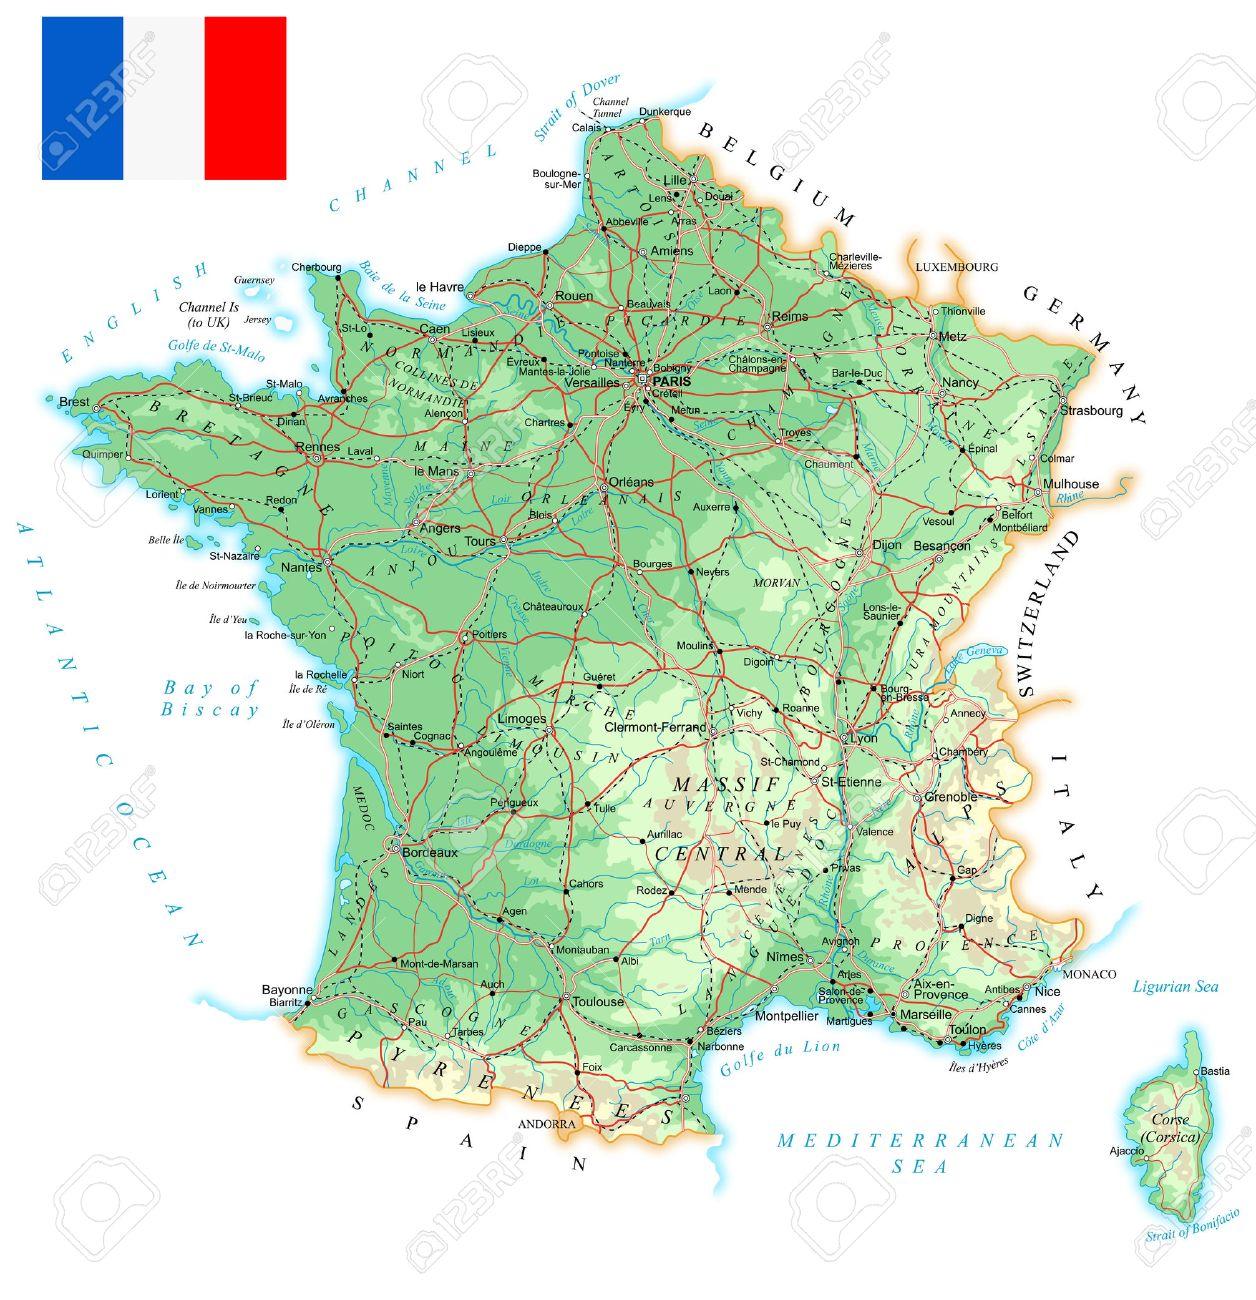 Francia Detalla Mapa Topografico Ilustracion Mapa Contiene